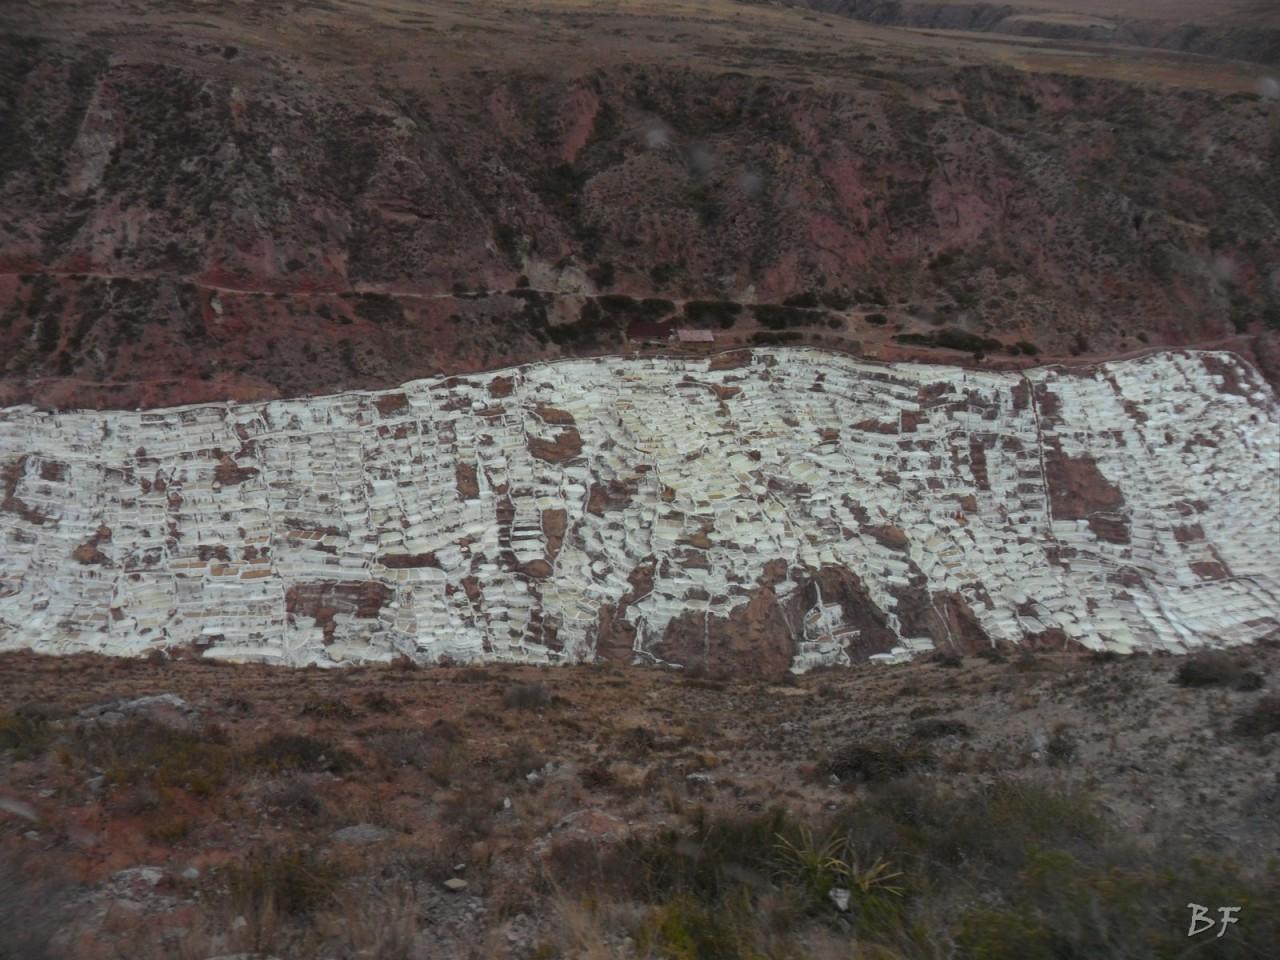 Terrazze-Circolari-Megaliti-Moray-Saline-Maras-Cusco-Perù-12